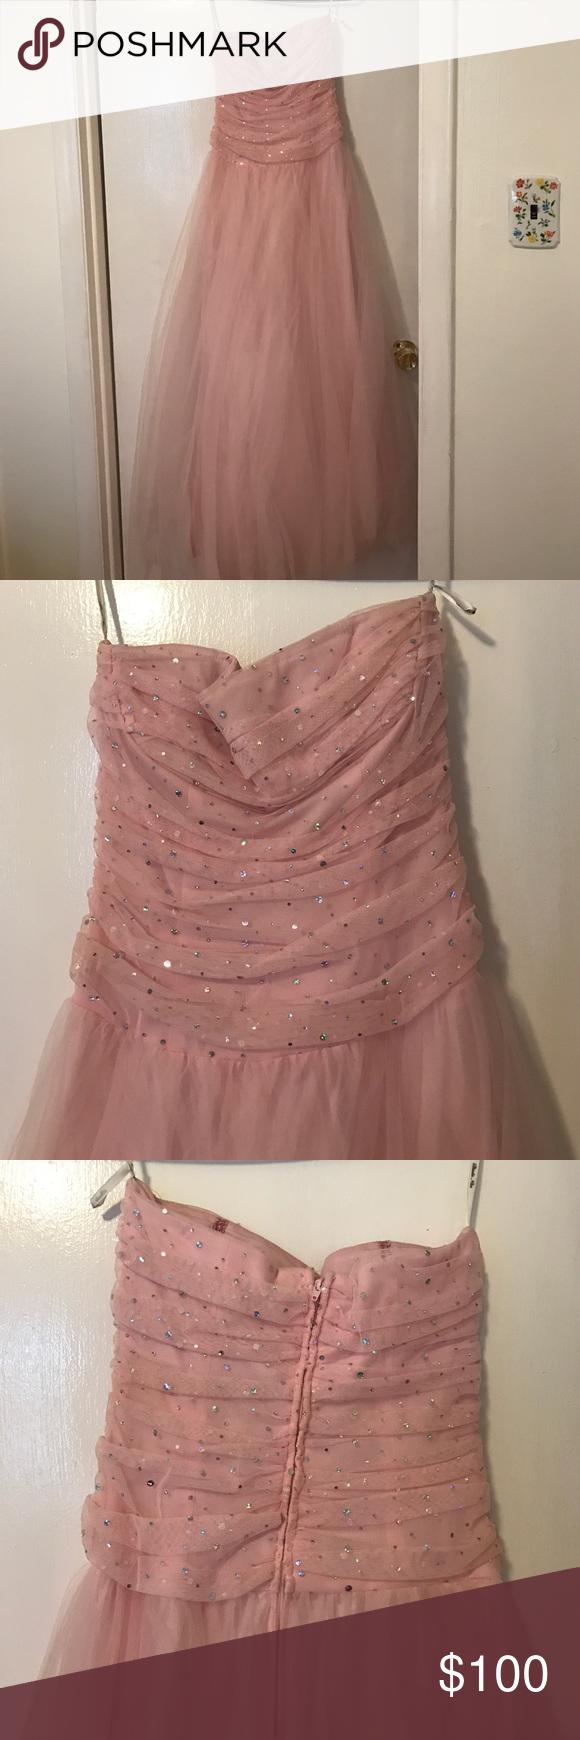 Blondie nites prom dress light pinkstrapless very good